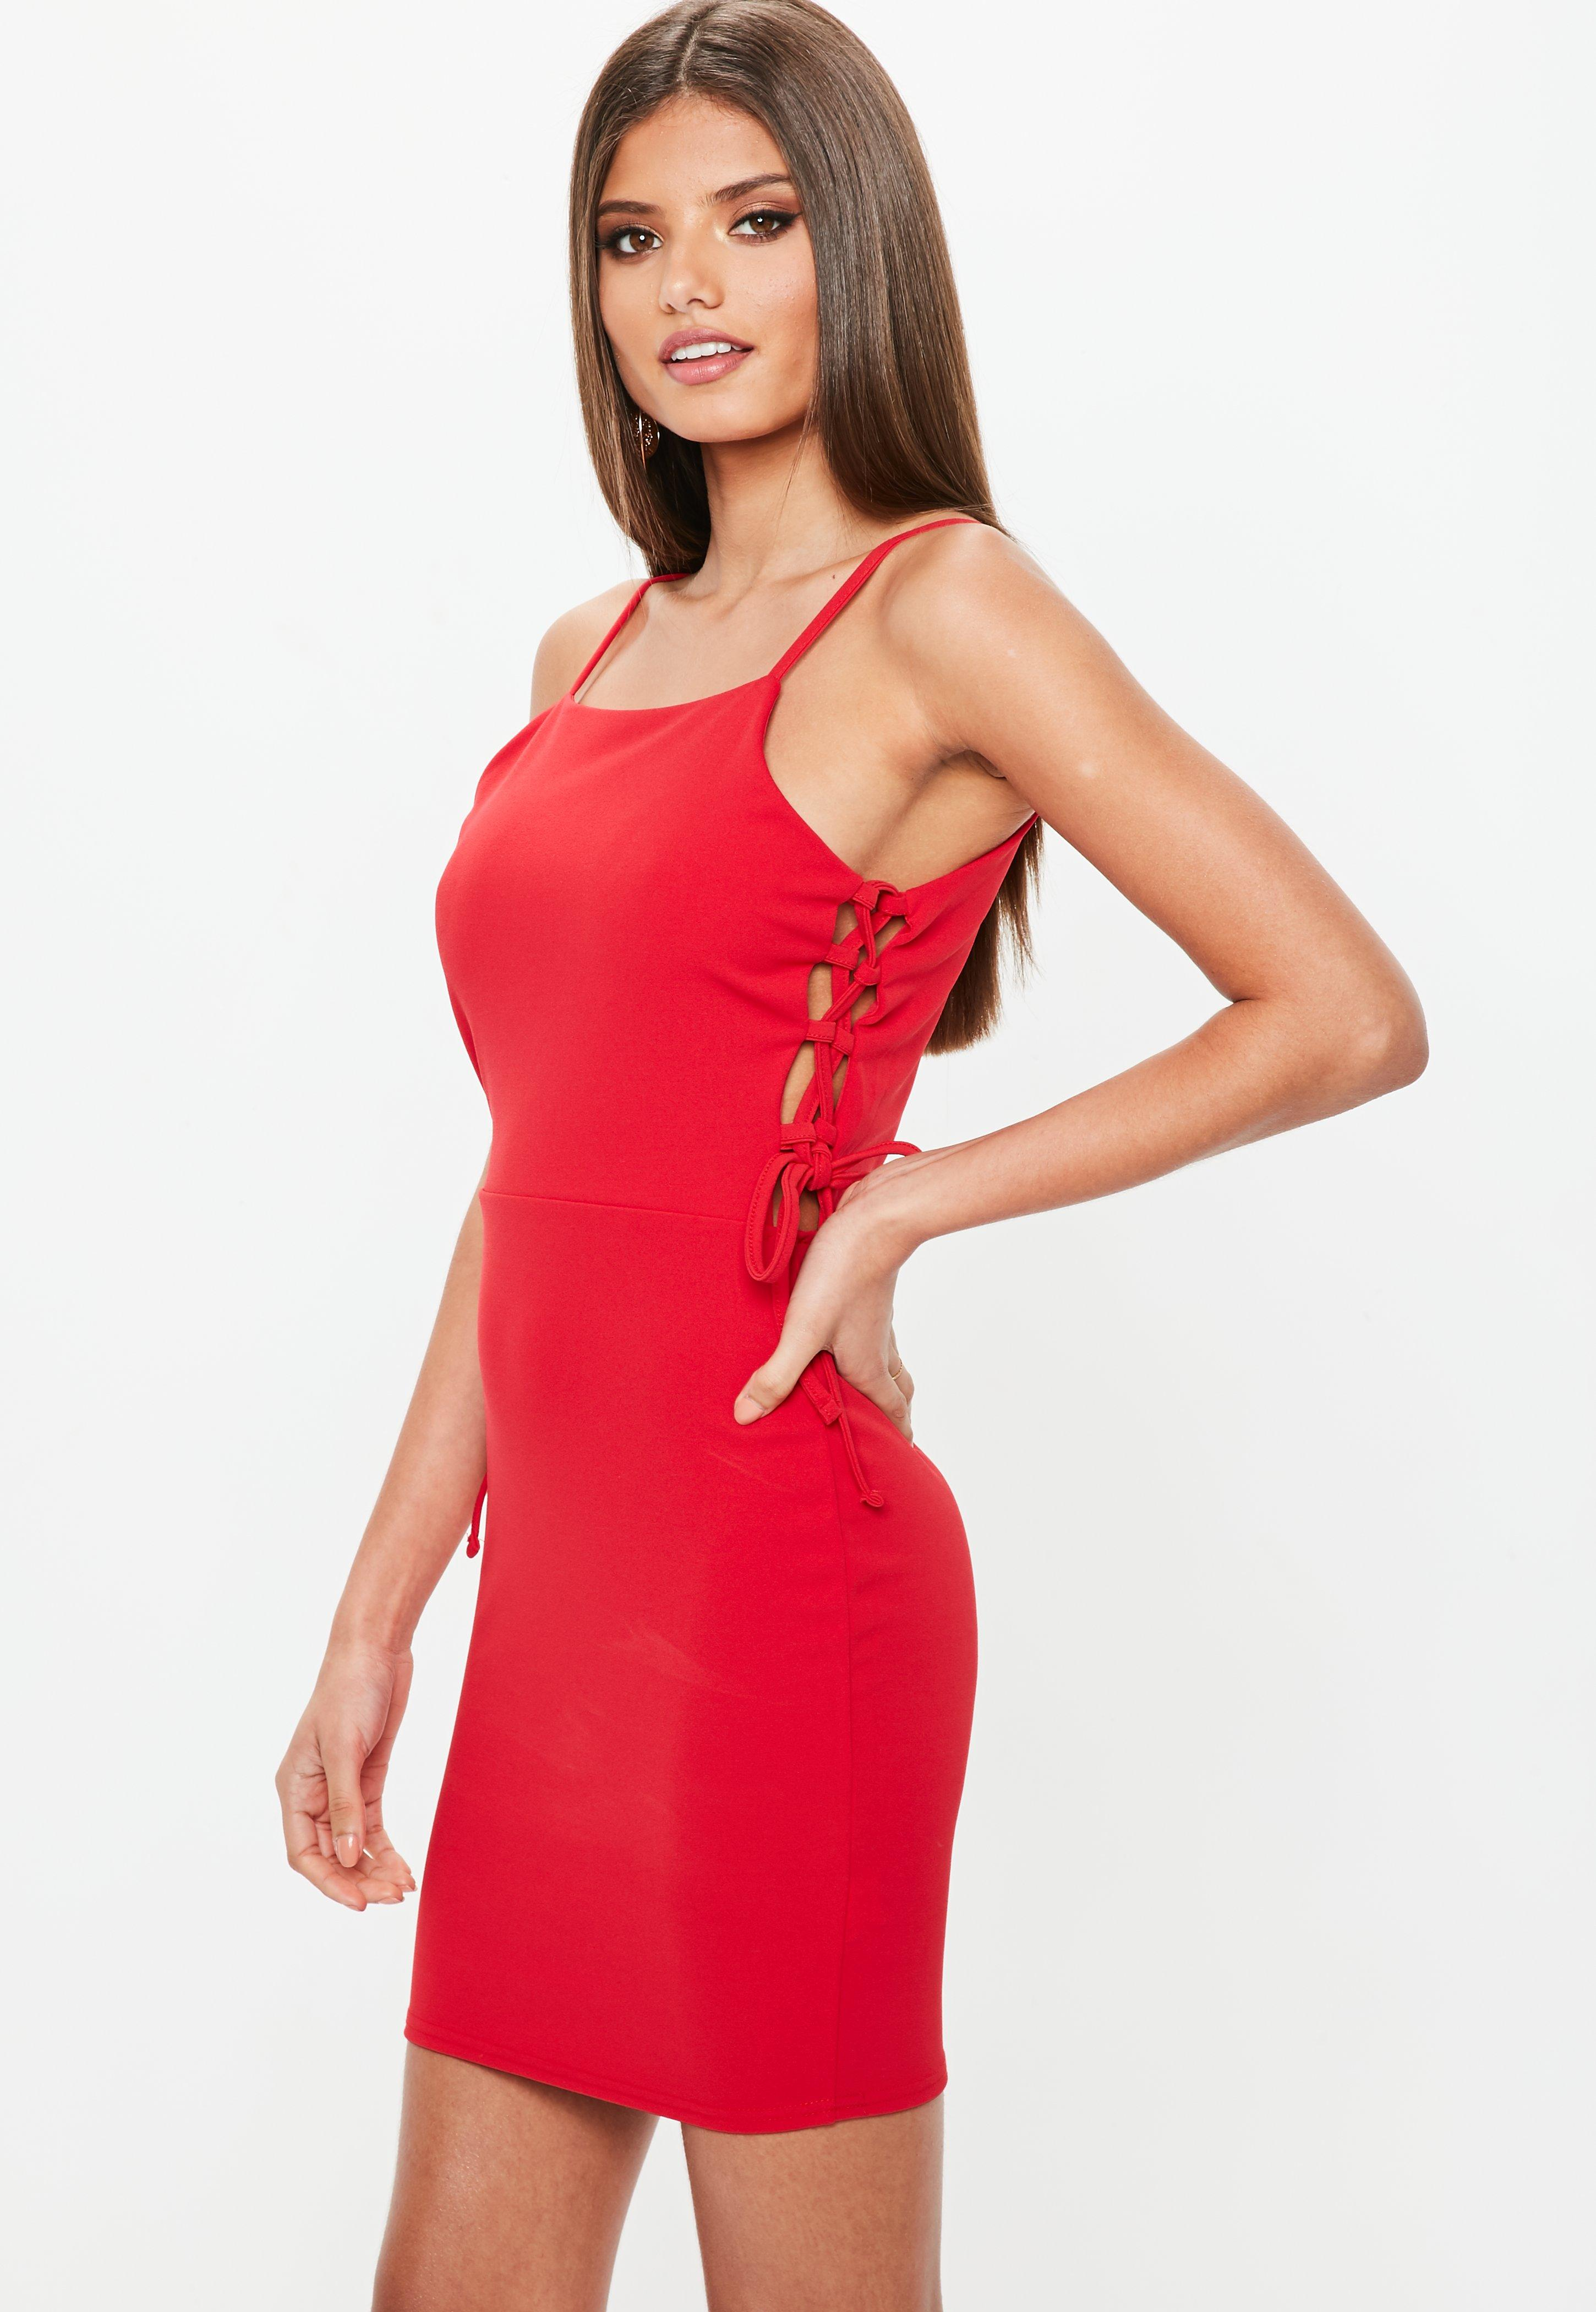 Black dress red lace